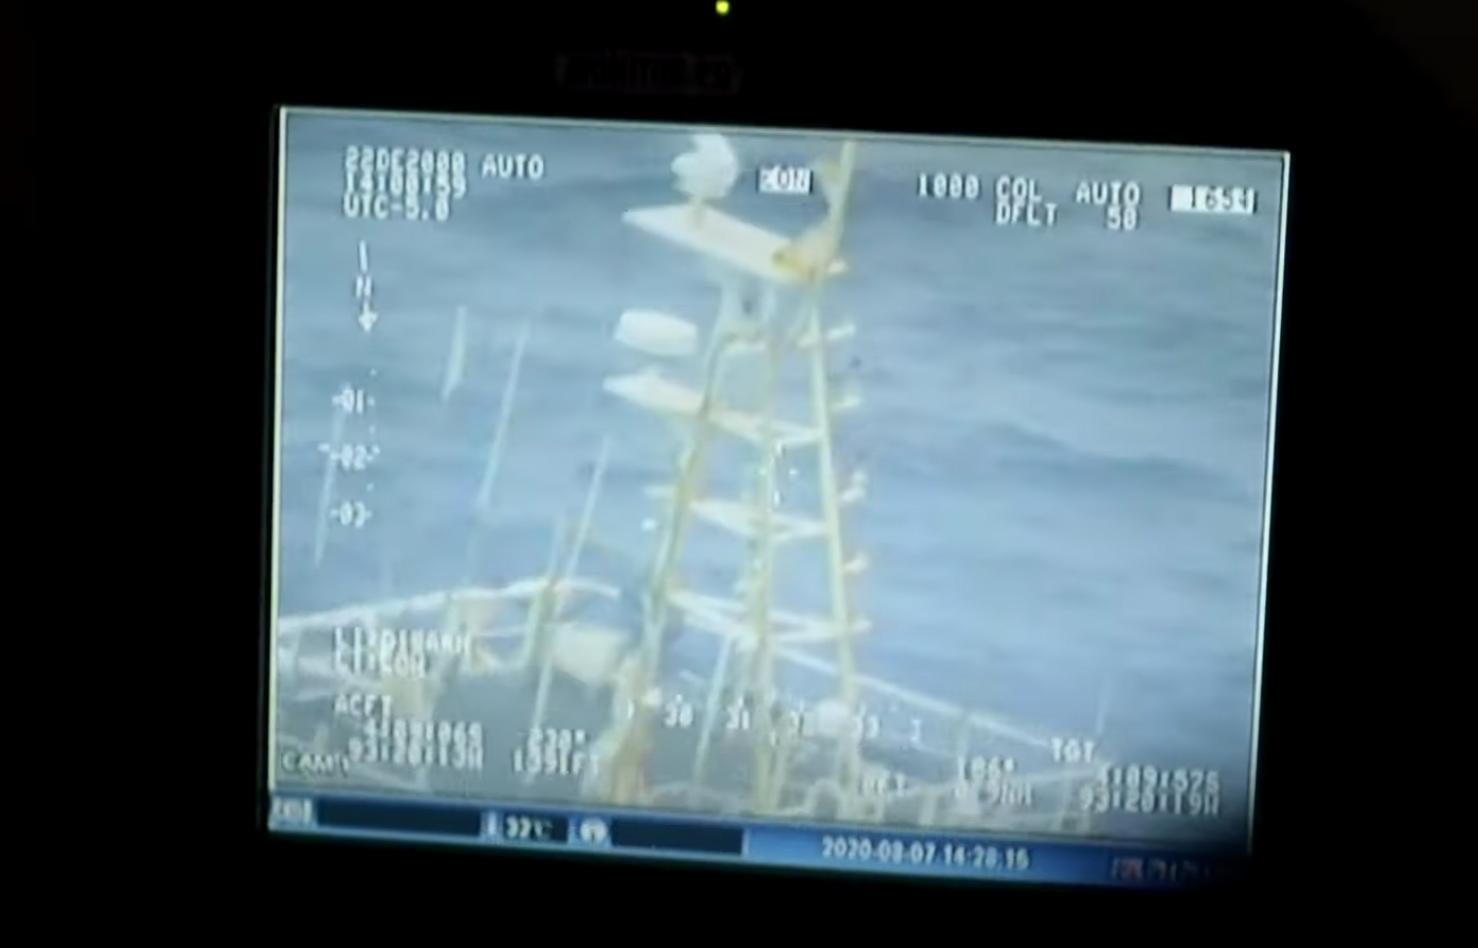 The Ecuadorian Navy monitors activity around the EEZ.